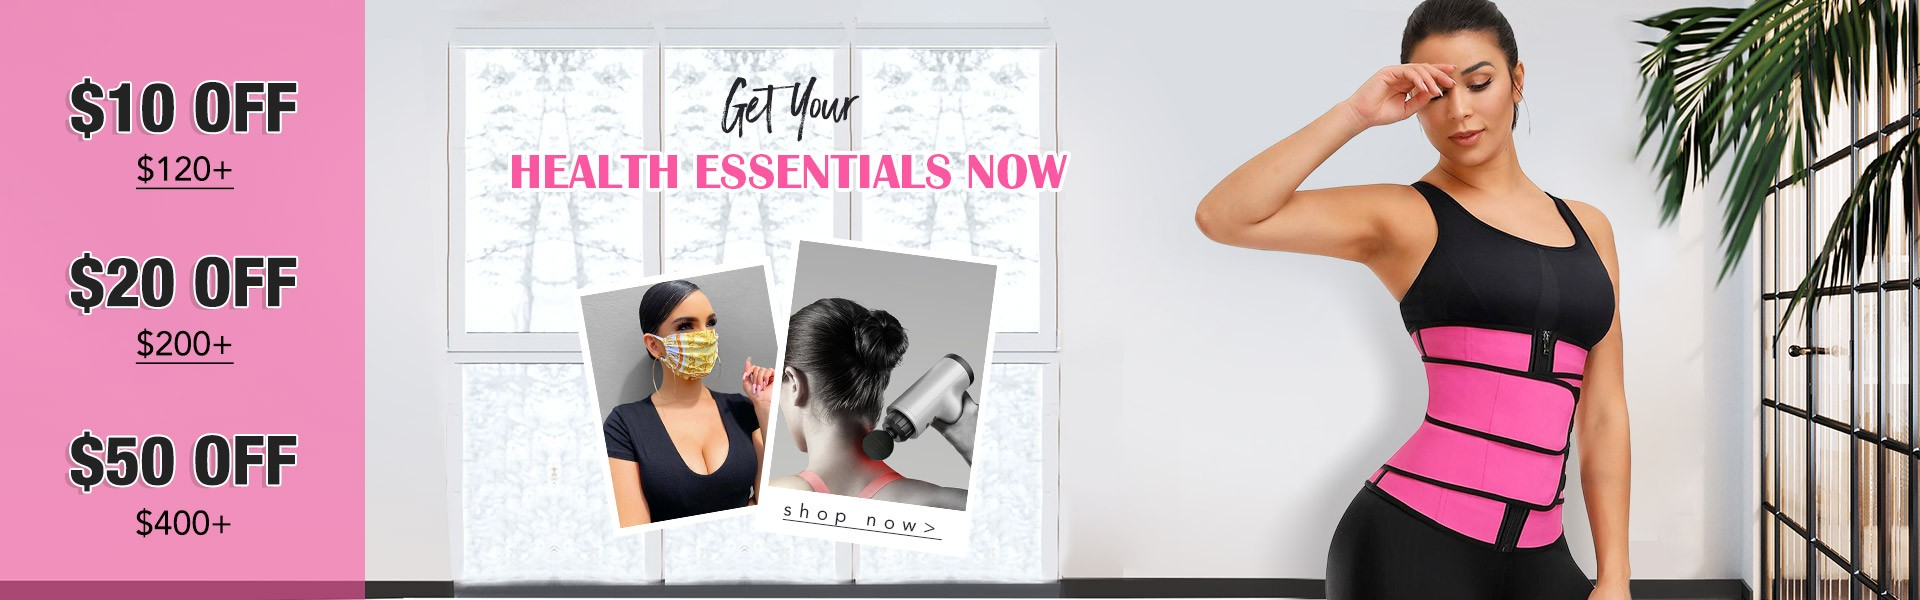 Get Your Health Essentials NOW